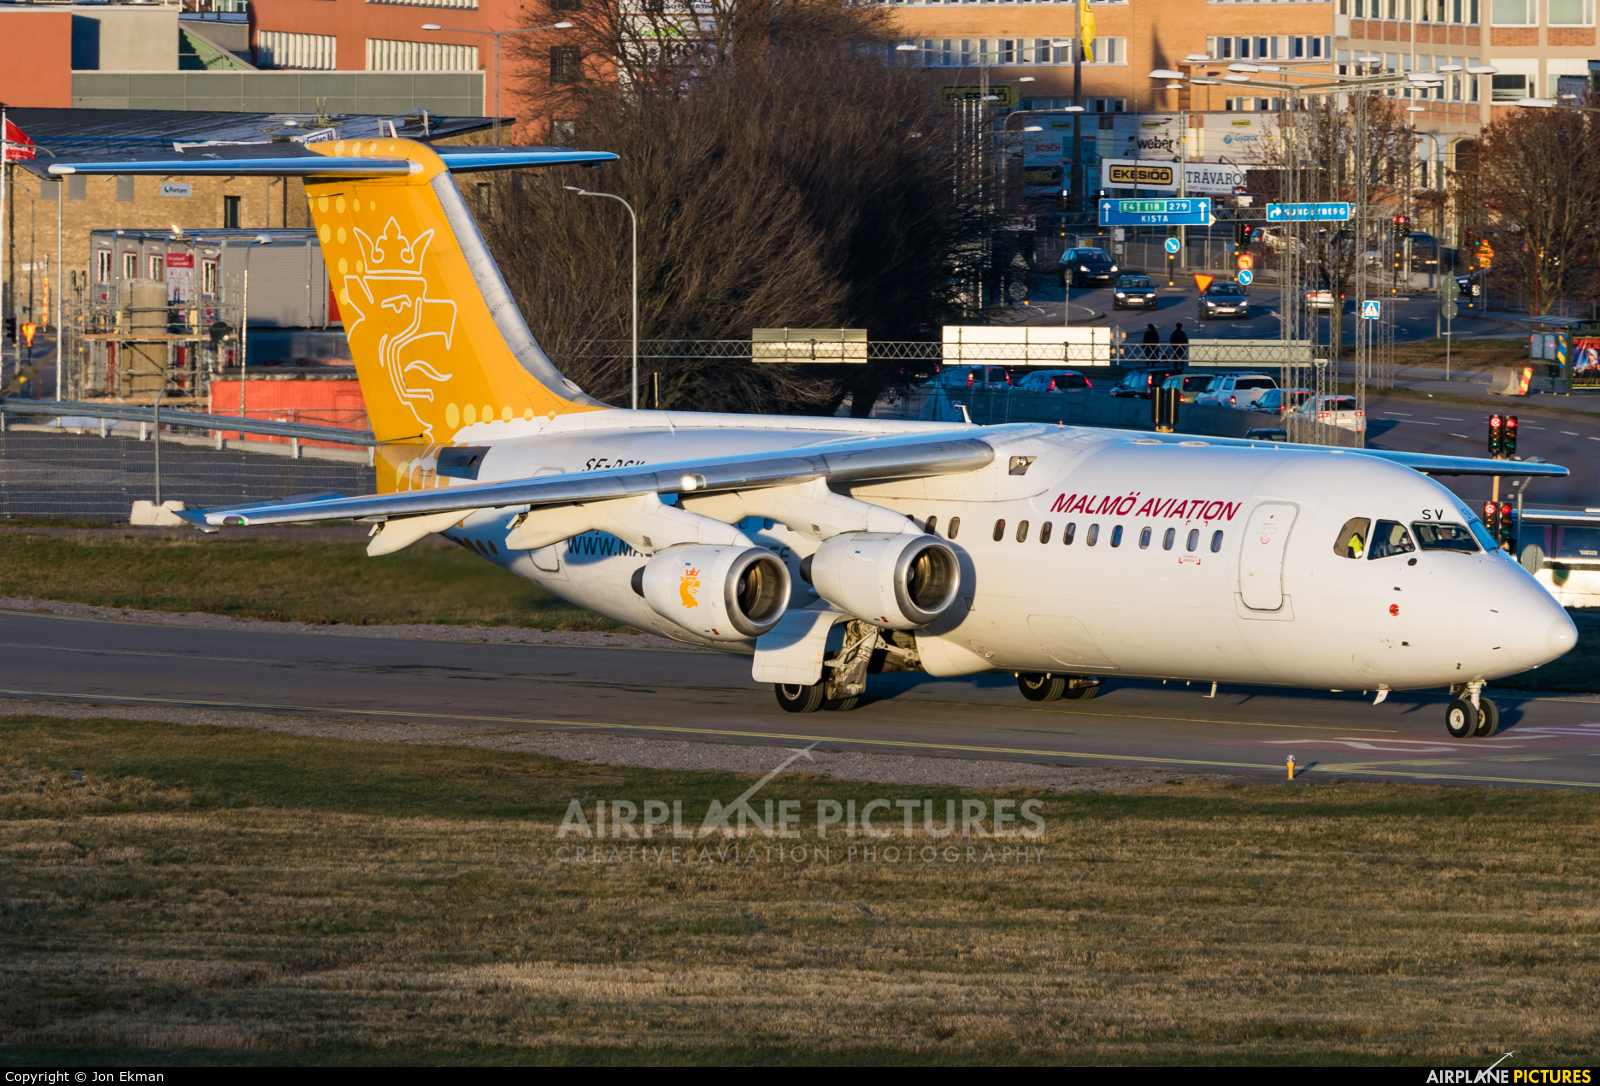 Malmo Aviation SE-DSV aircraft at Stockholm - Bromma